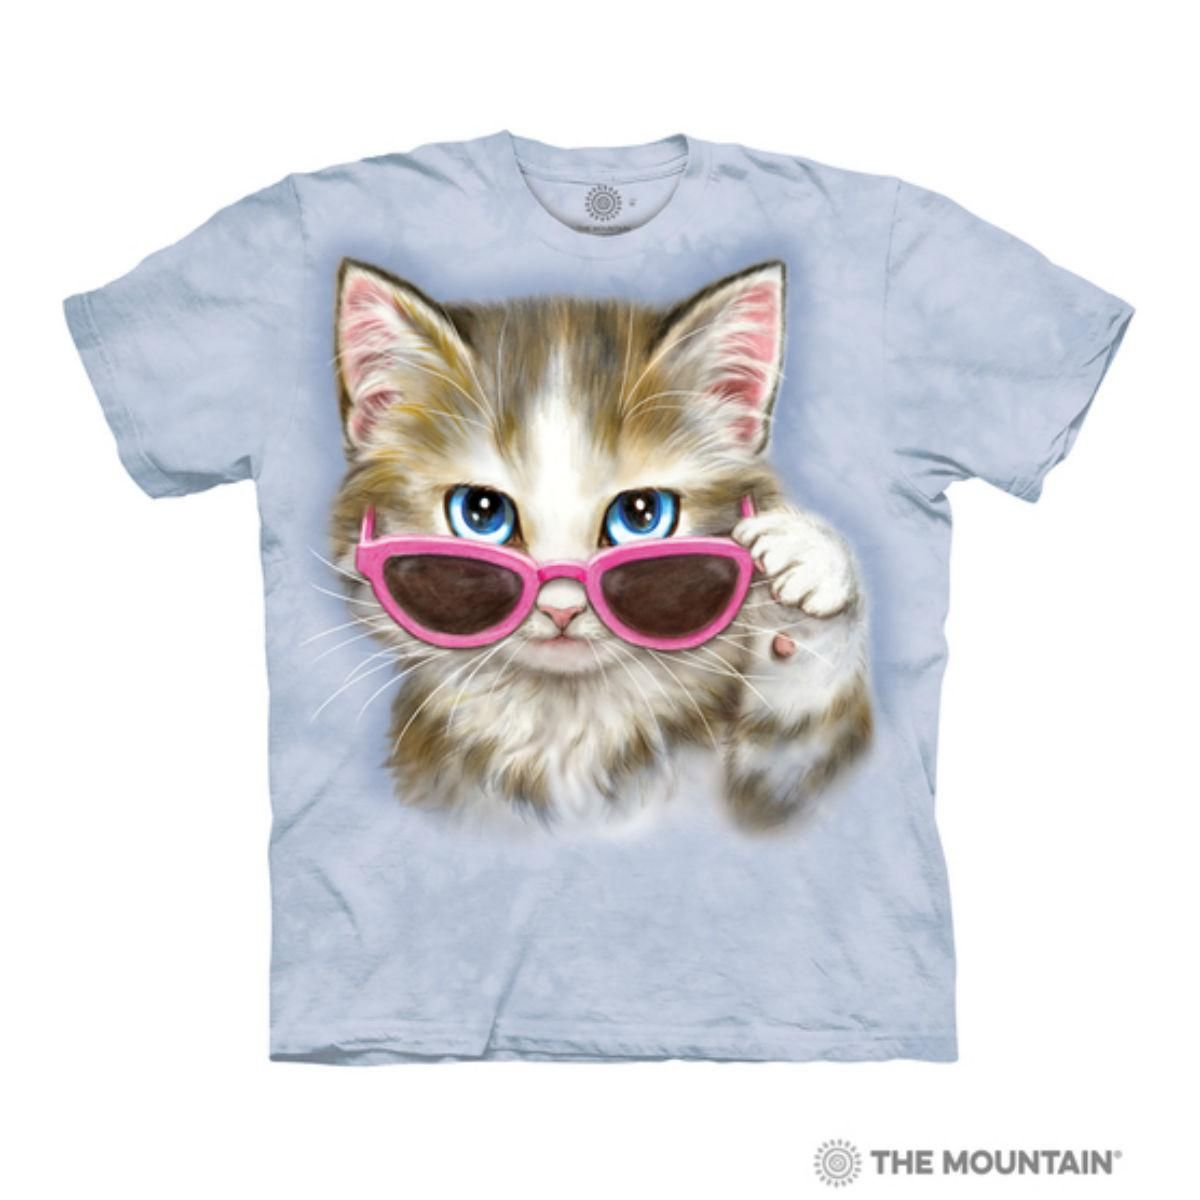 You Ve Cat To Be Kitten Me Face Human T Shirt By The Mountain In 2020 My T Shirt Cat Tshirt Tee Shirt Print